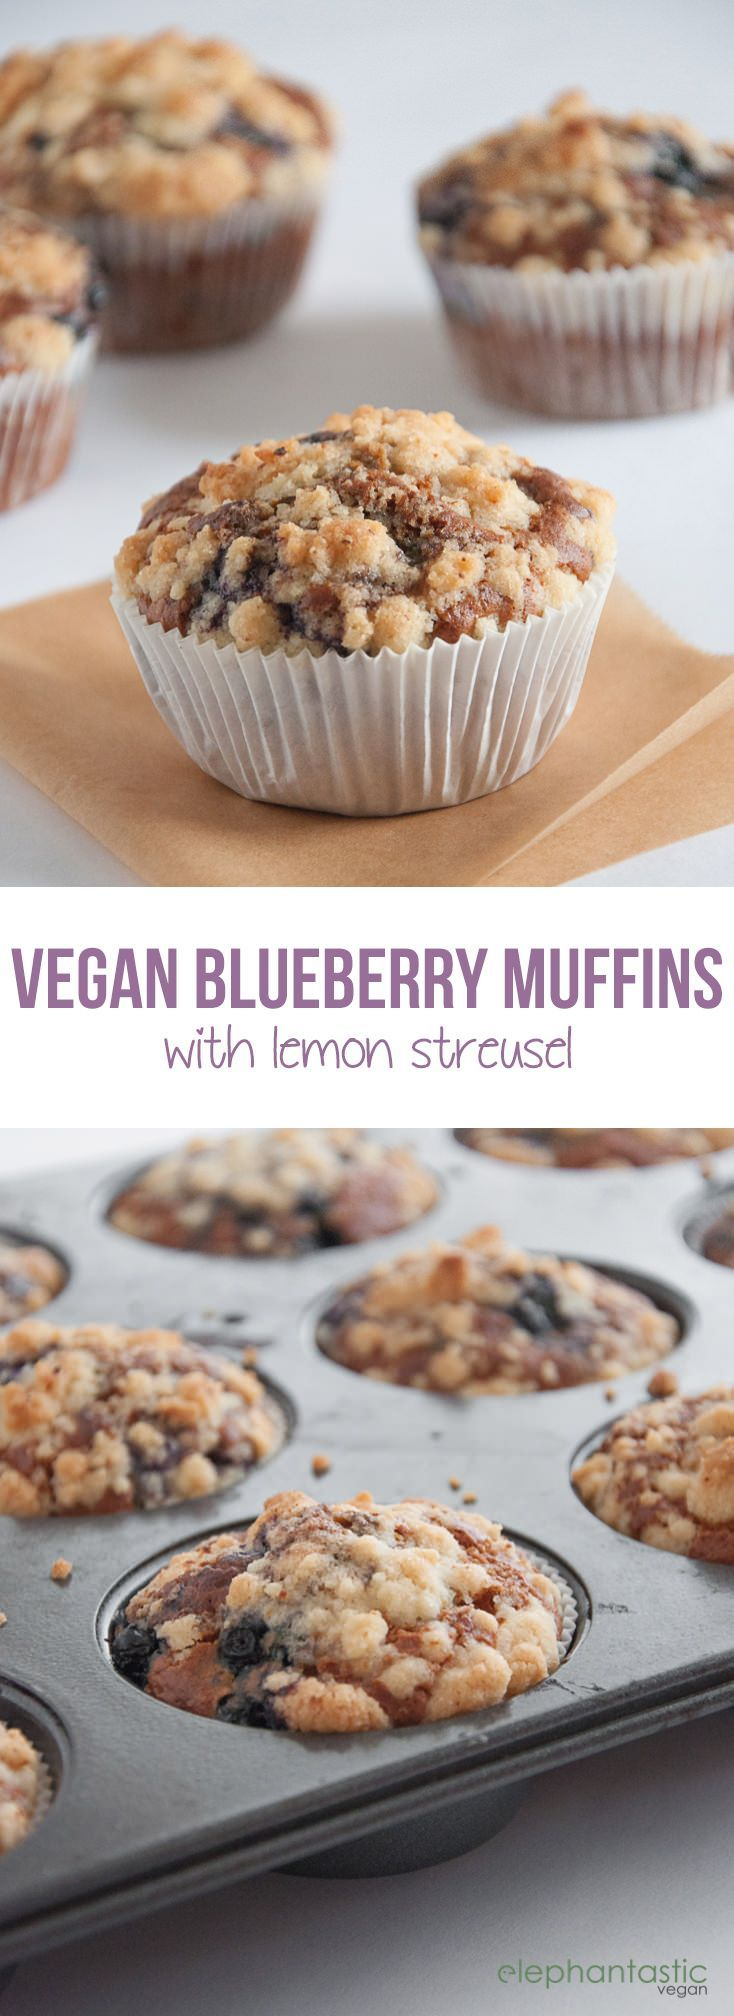 Vegan Blueberry Lemon Streusel Muffins | http://ElephantasticVegan.com